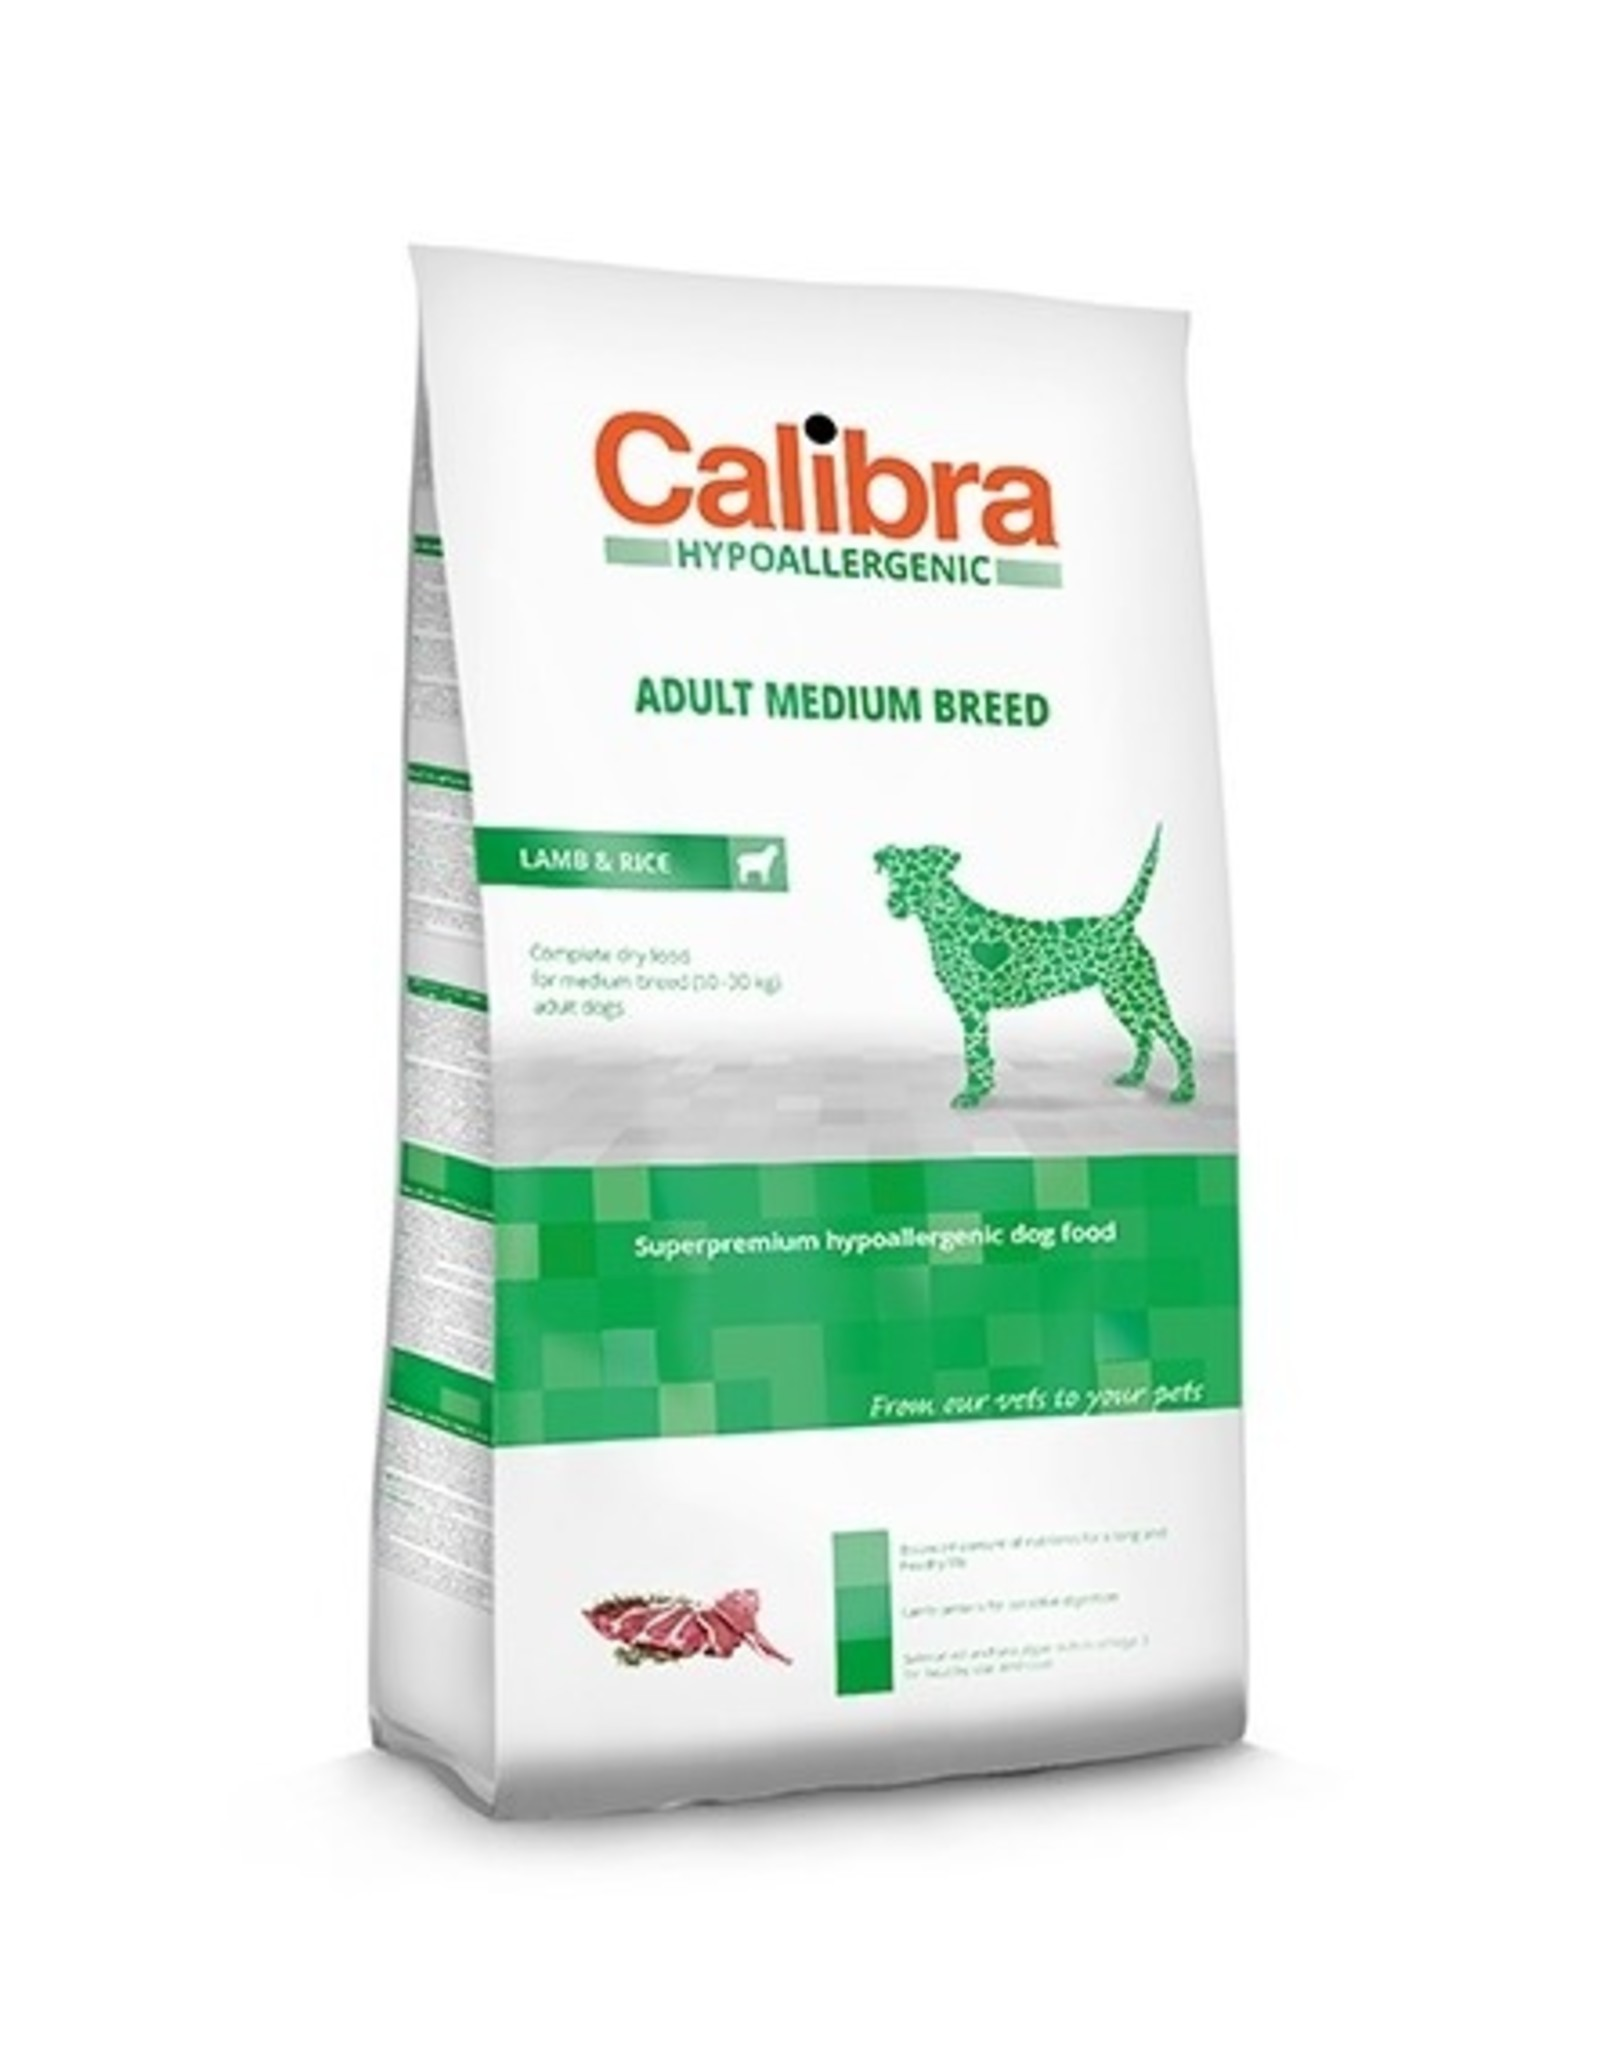 Calibra Calibra Dog Superpremium Trockenfutter Hypoallergenic